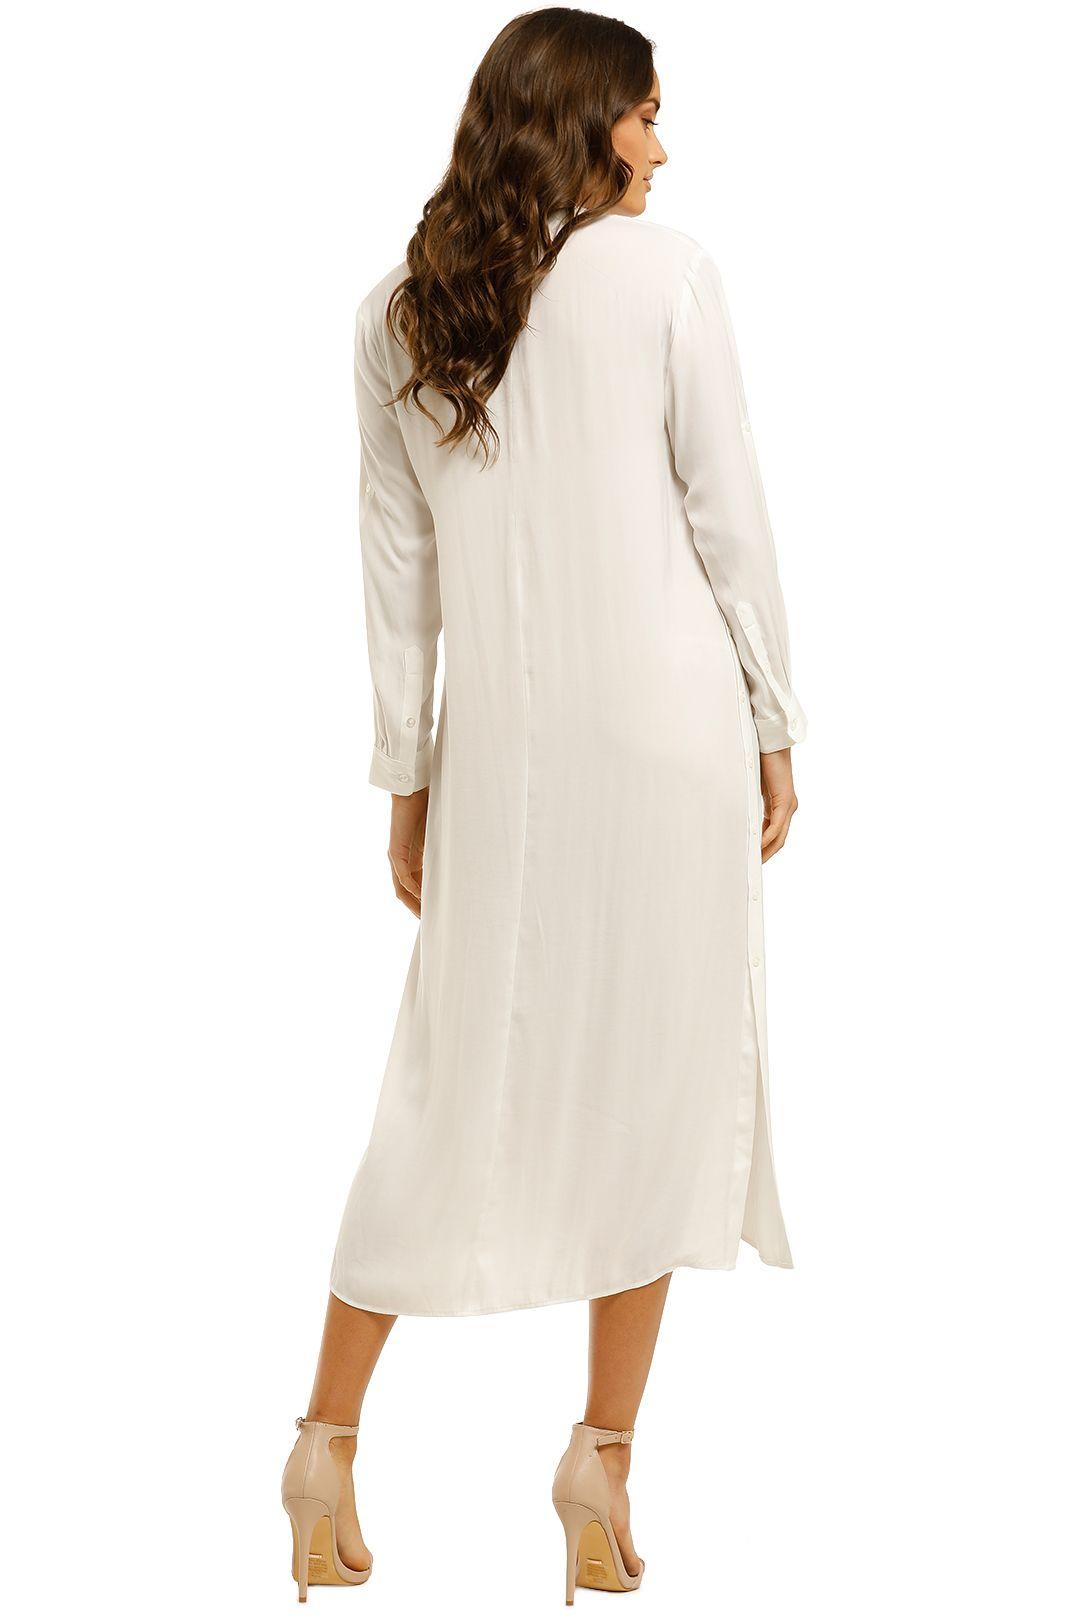 Grace-Willow-Ally-Shirt-Dress-White-Back